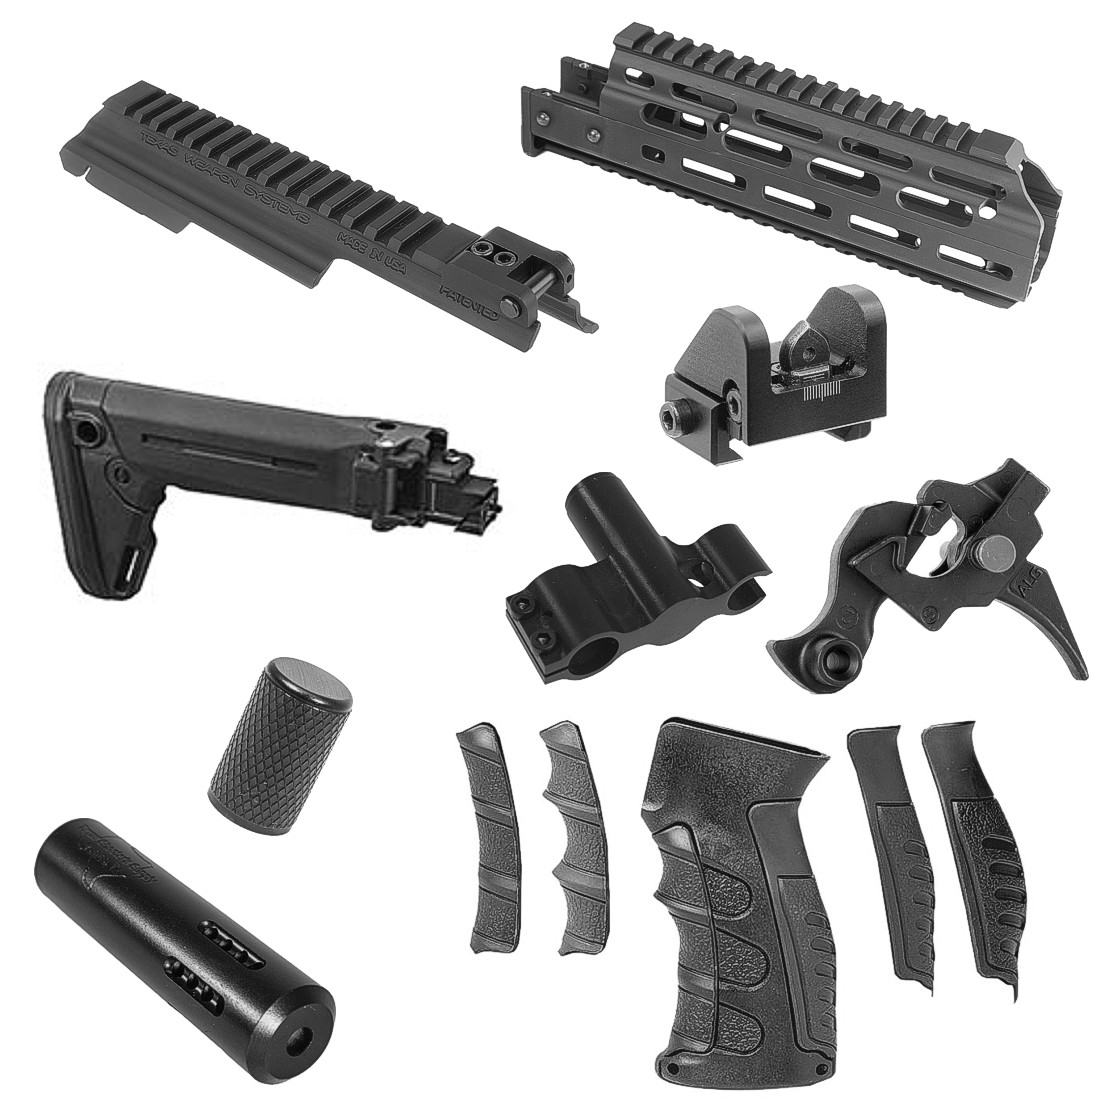 Tss Custom Ak Liberator Rifle Diy Upgrade Builder Kit Texas Shooter S Supply Us made ak issues : tss custom ak liberator rifle diy upgrade builder kit